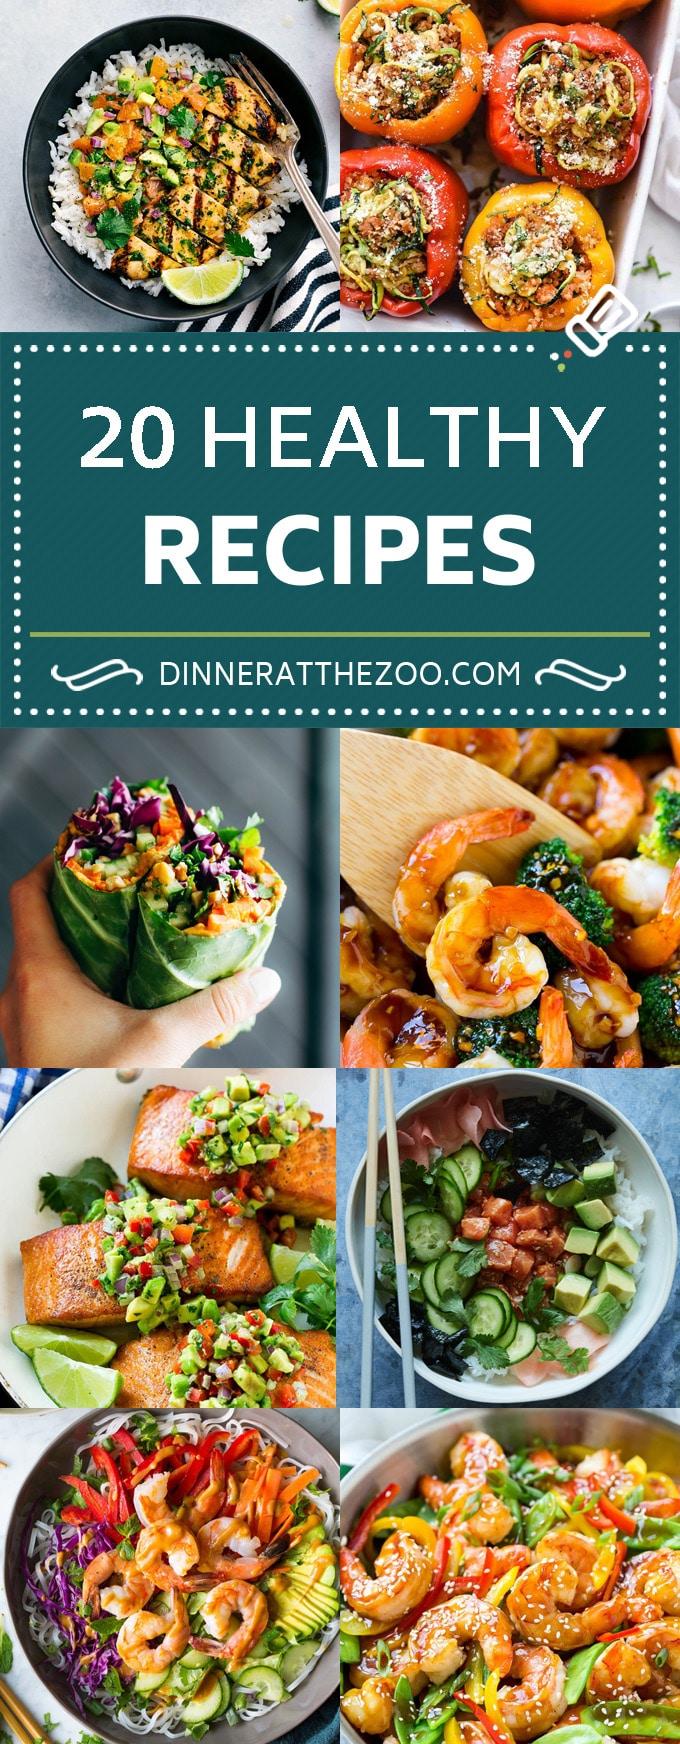 20 Healthy Recipes | Healthy Chicken Recipes | Healthy Shrimp Recipes | Low Carb Recipes #healthy #cleaneating #lowcarb #dinner #dinneratthezoo